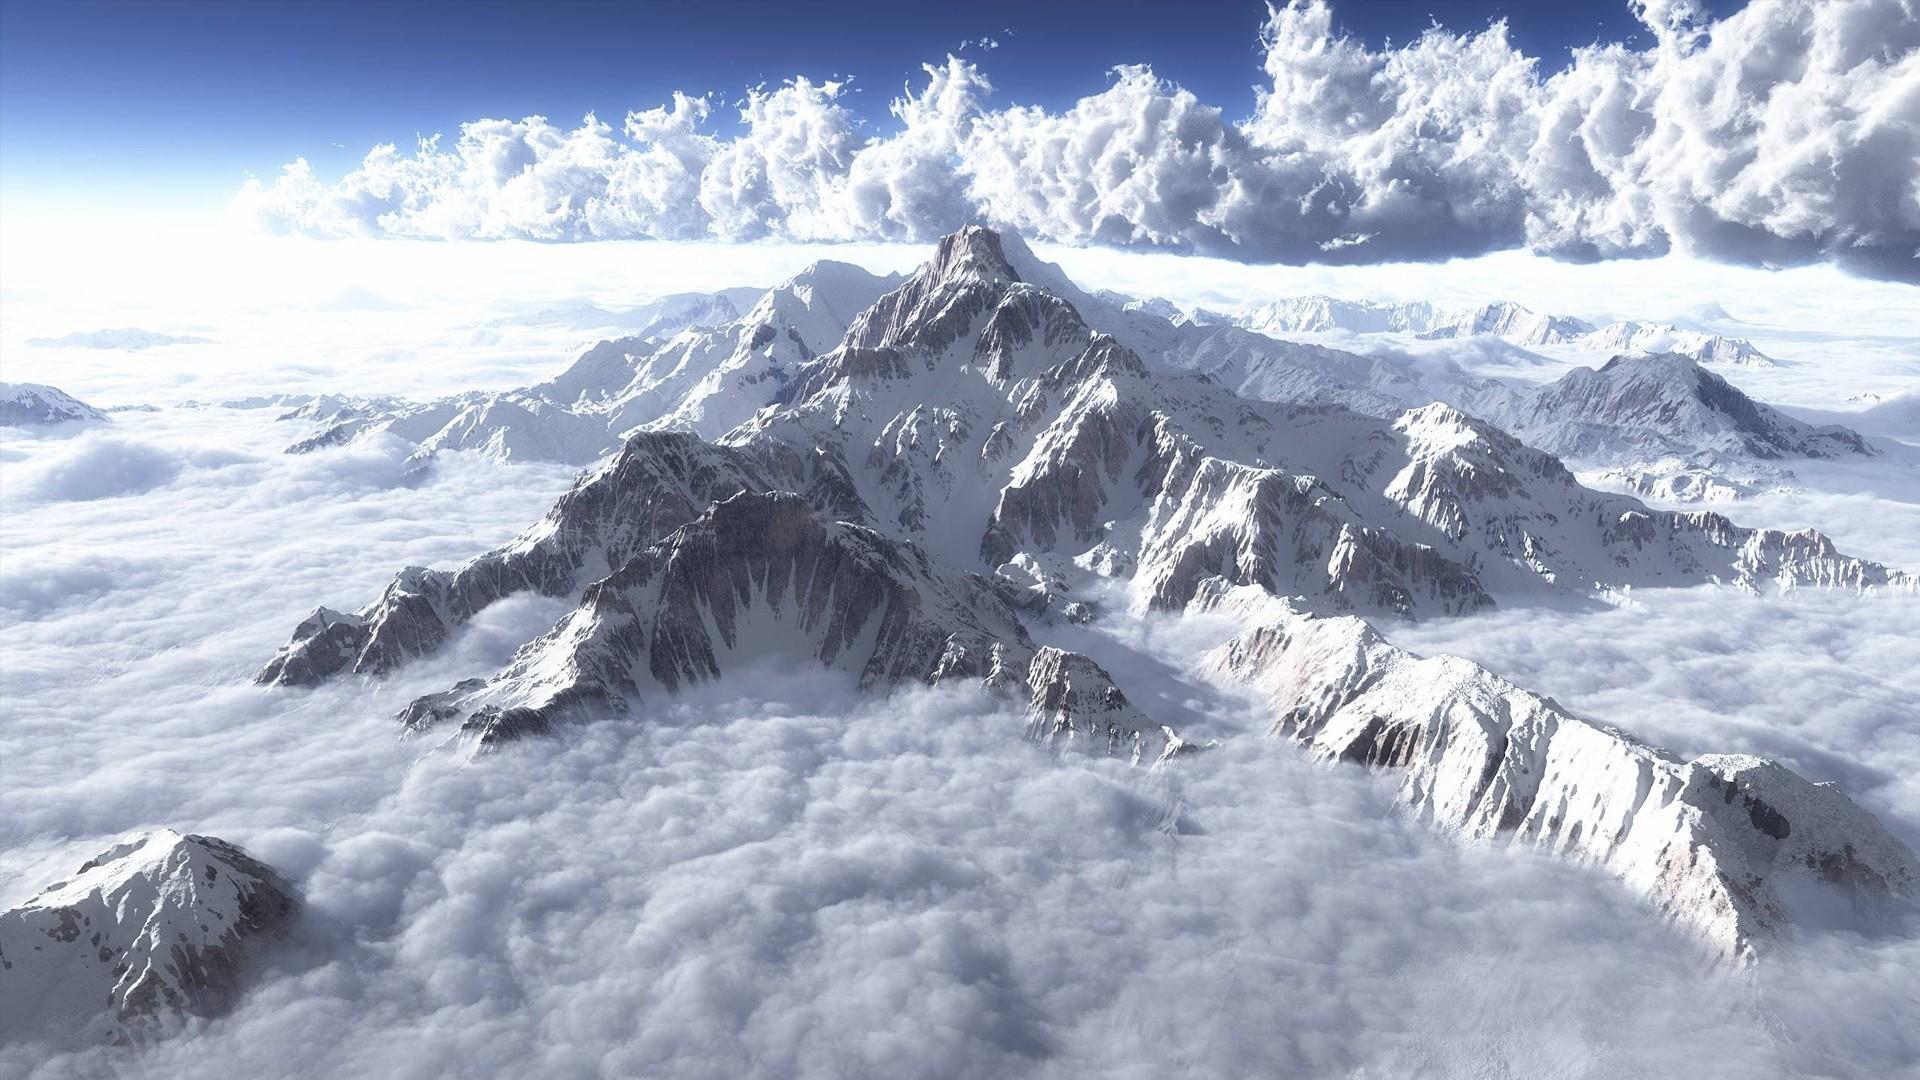 Snowy Mountains Wallpaper 3454